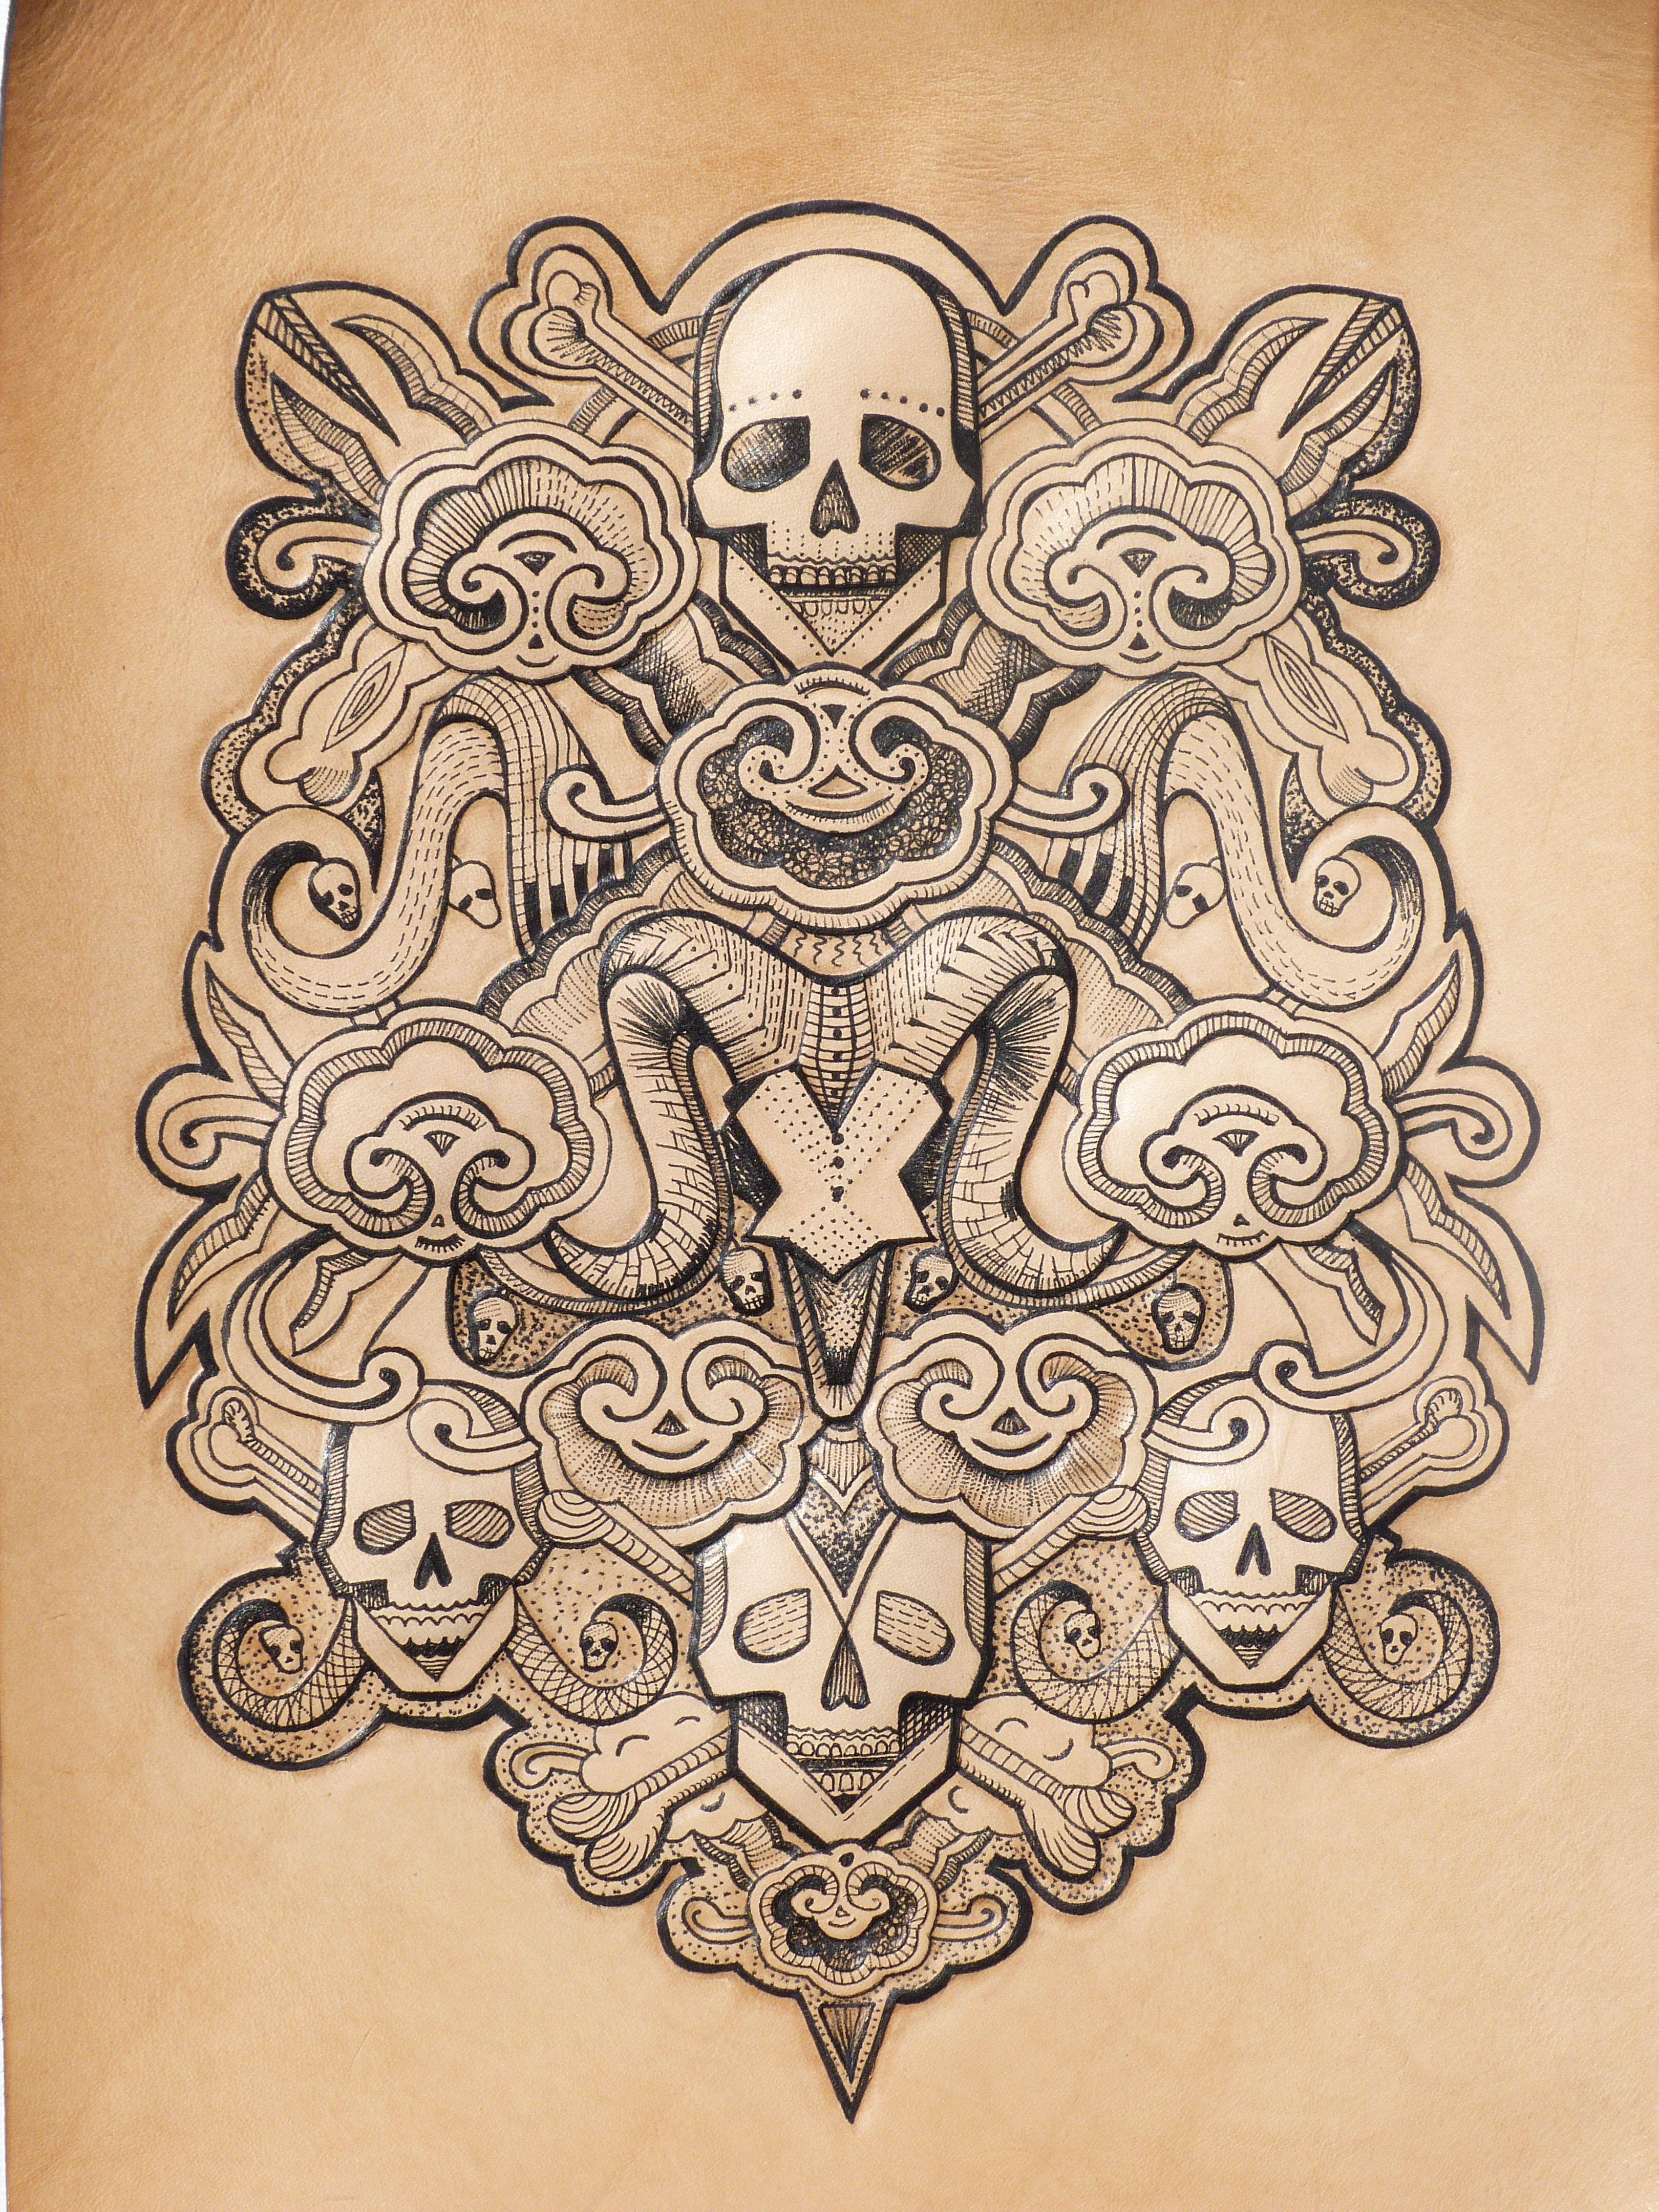 Tattooed Skull Bones By Punctured Artefact Http Www Etsy Com Shop Puncturedartefact Skull Skull And Bones Sacred Geometry Illustration